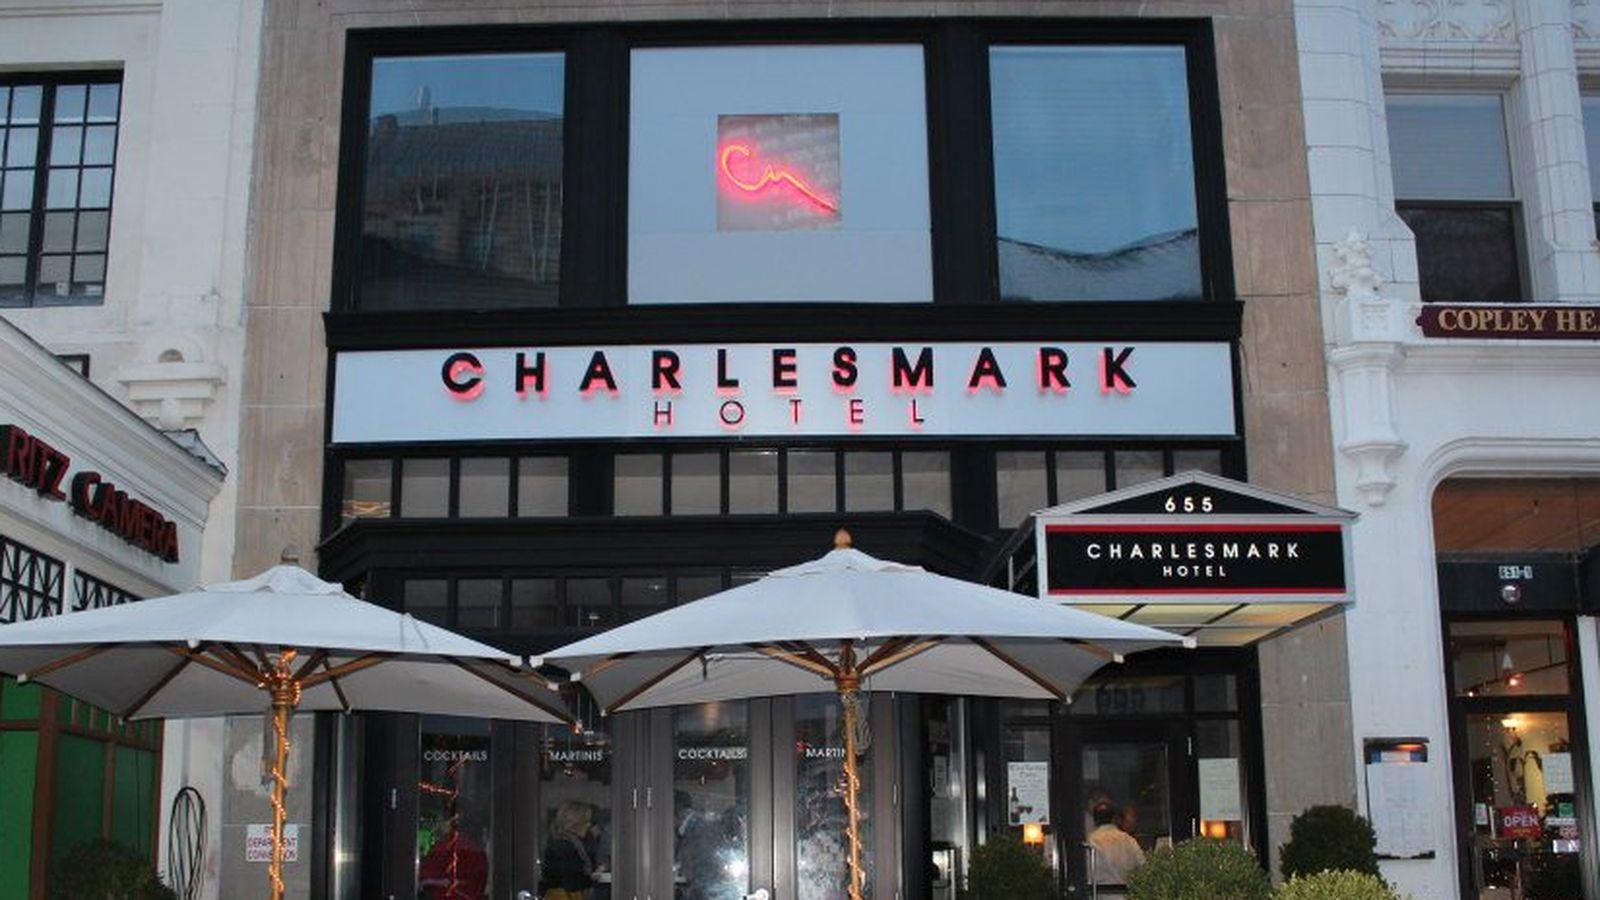 charlesmark hotel operator 39 i saw it i felt it 39 eater. Black Bedroom Furniture Sets. Home Design Ideas